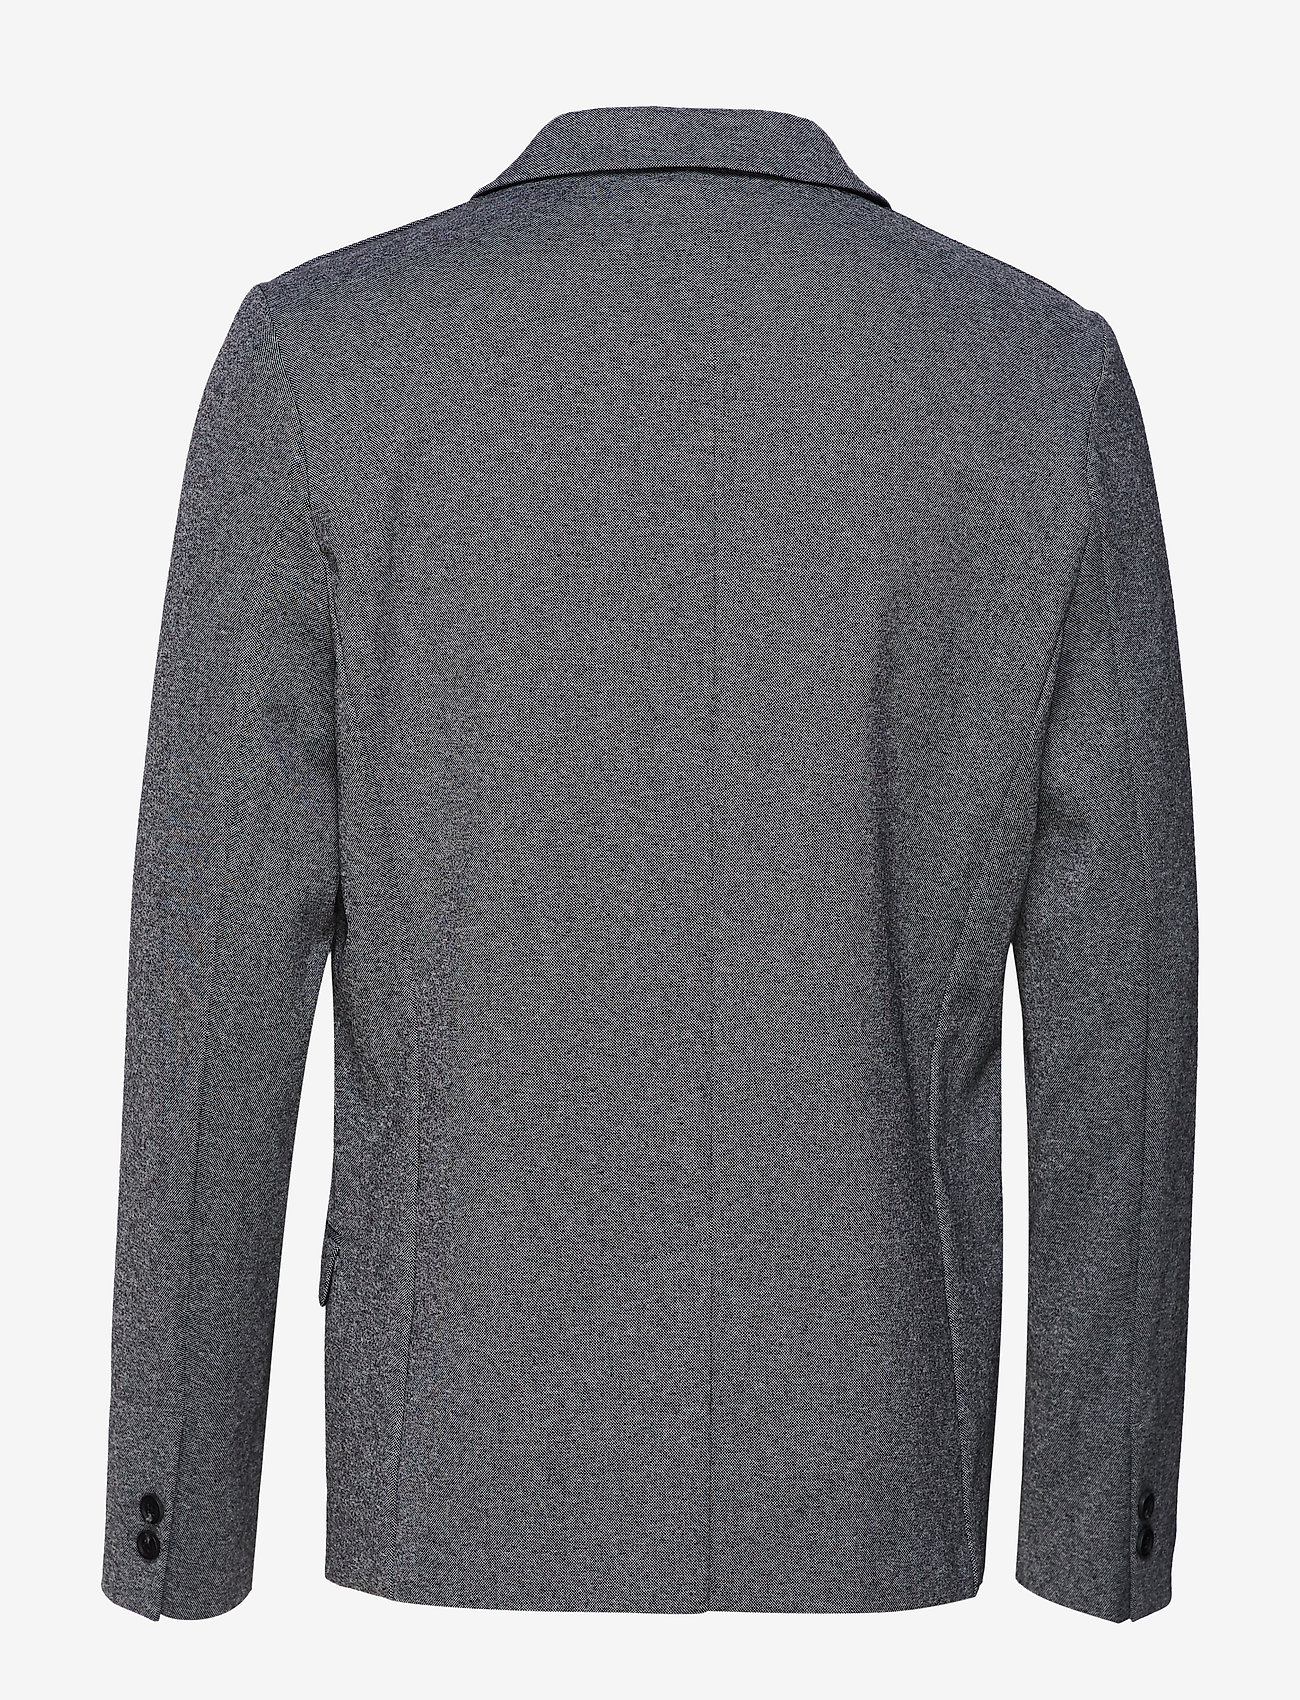 Superflex Knitted Blazer (Grey Mix) (74.98 €) - Lindbergh qkw79